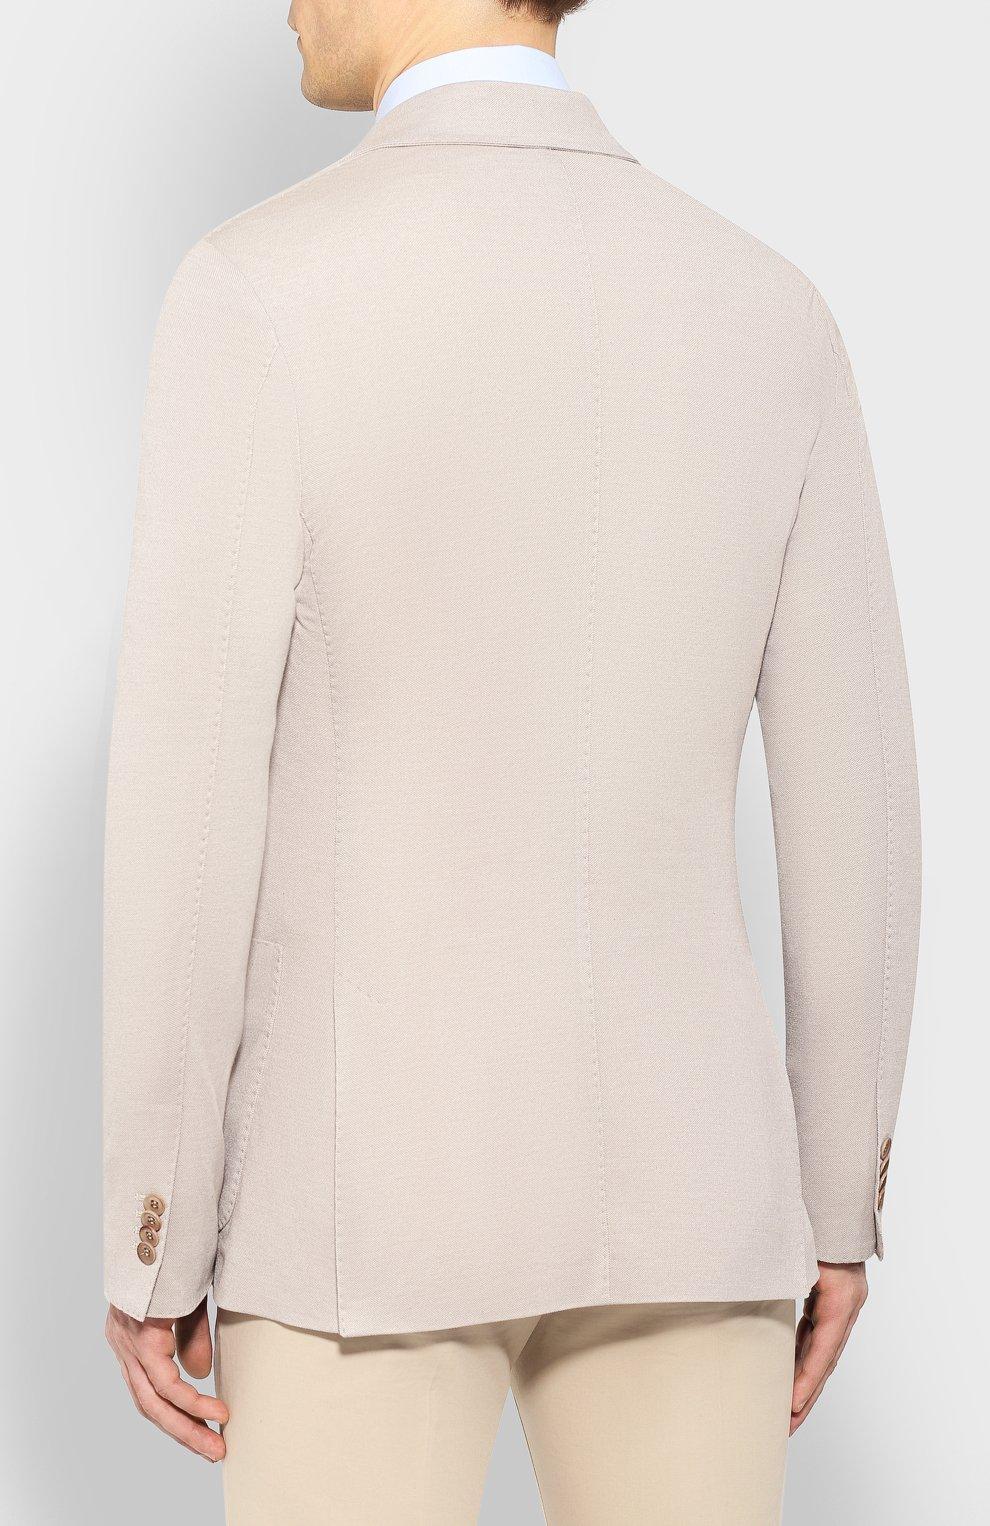 Мужской пиджак из смеси хлопка и шелка LORO PIANA светло-бежевого цвета, арт. FAE8388 | Фото 4